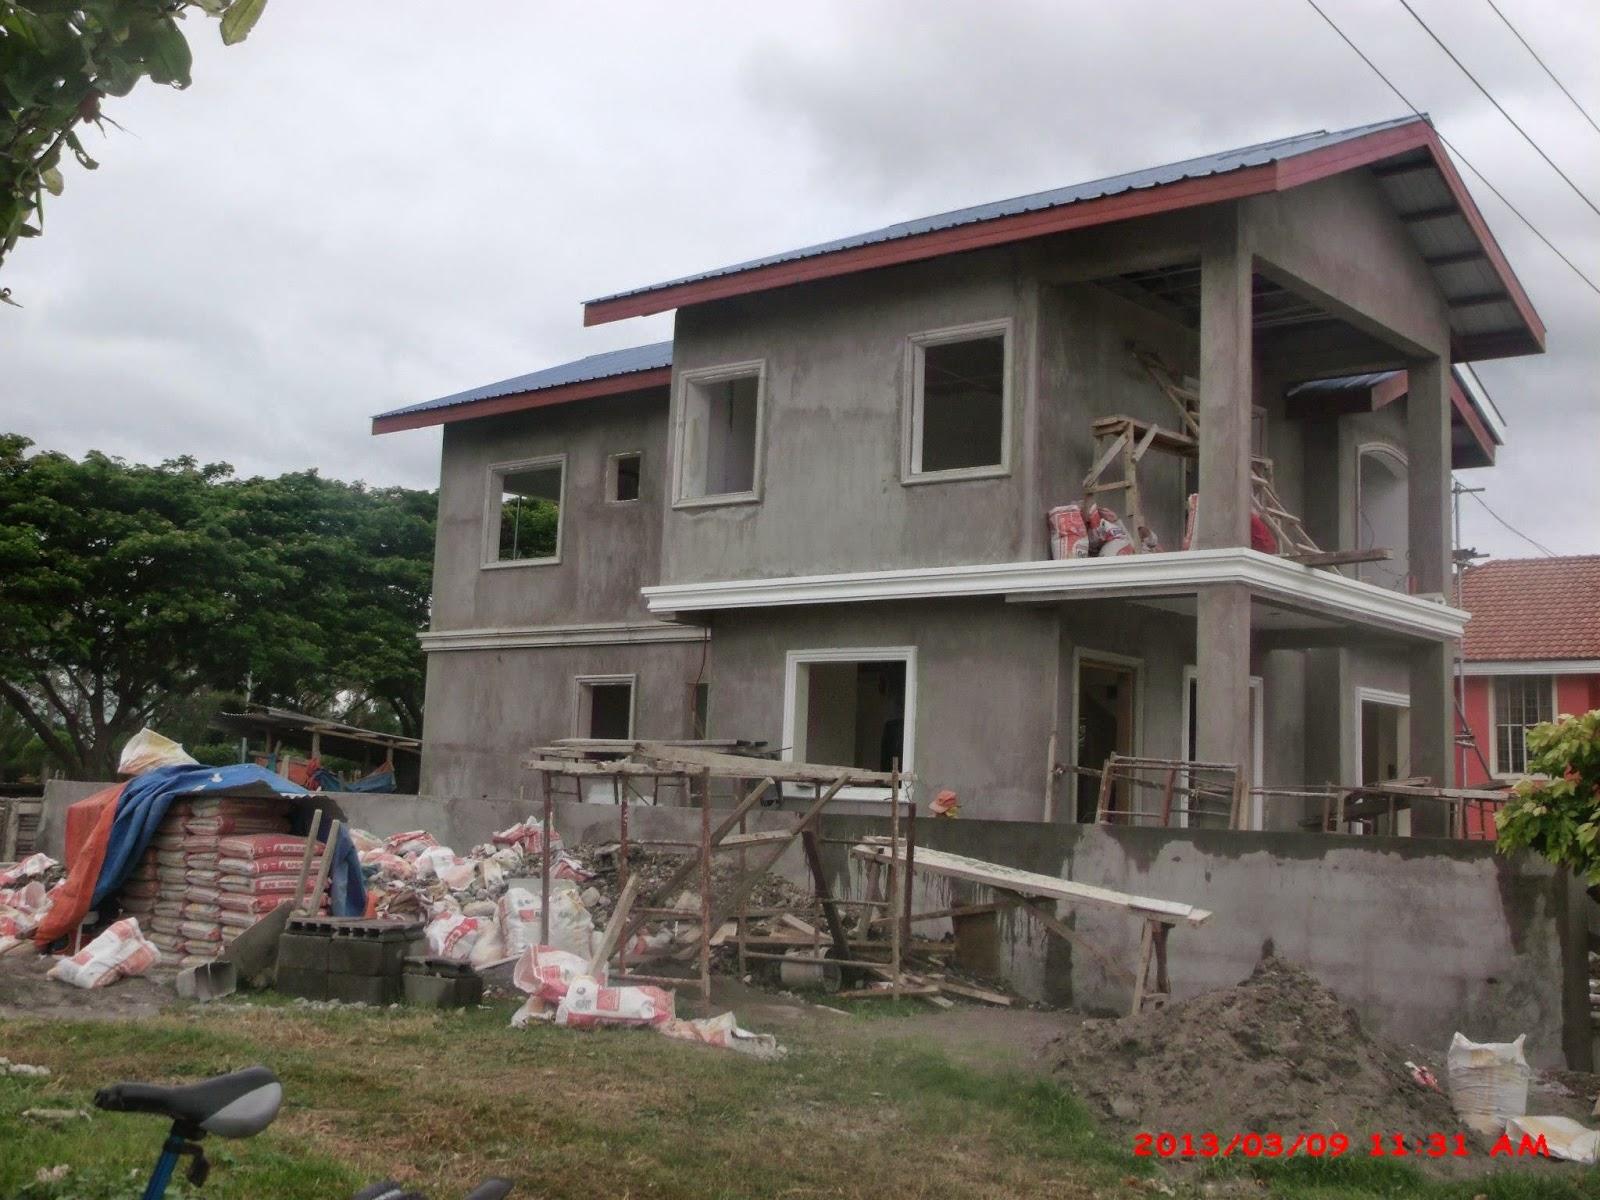 97+one+storey+house+design+philippines+iloilo+2+storey+house+designs+iloilo+philippines+house+plans+iloilo+house+plans+in+the+philippines+iloilo+two+storey+house+design+in+the+philippines+iloilo+philippines+house+design+2 - Get Modern Simple Small Two Storey House Design Gif